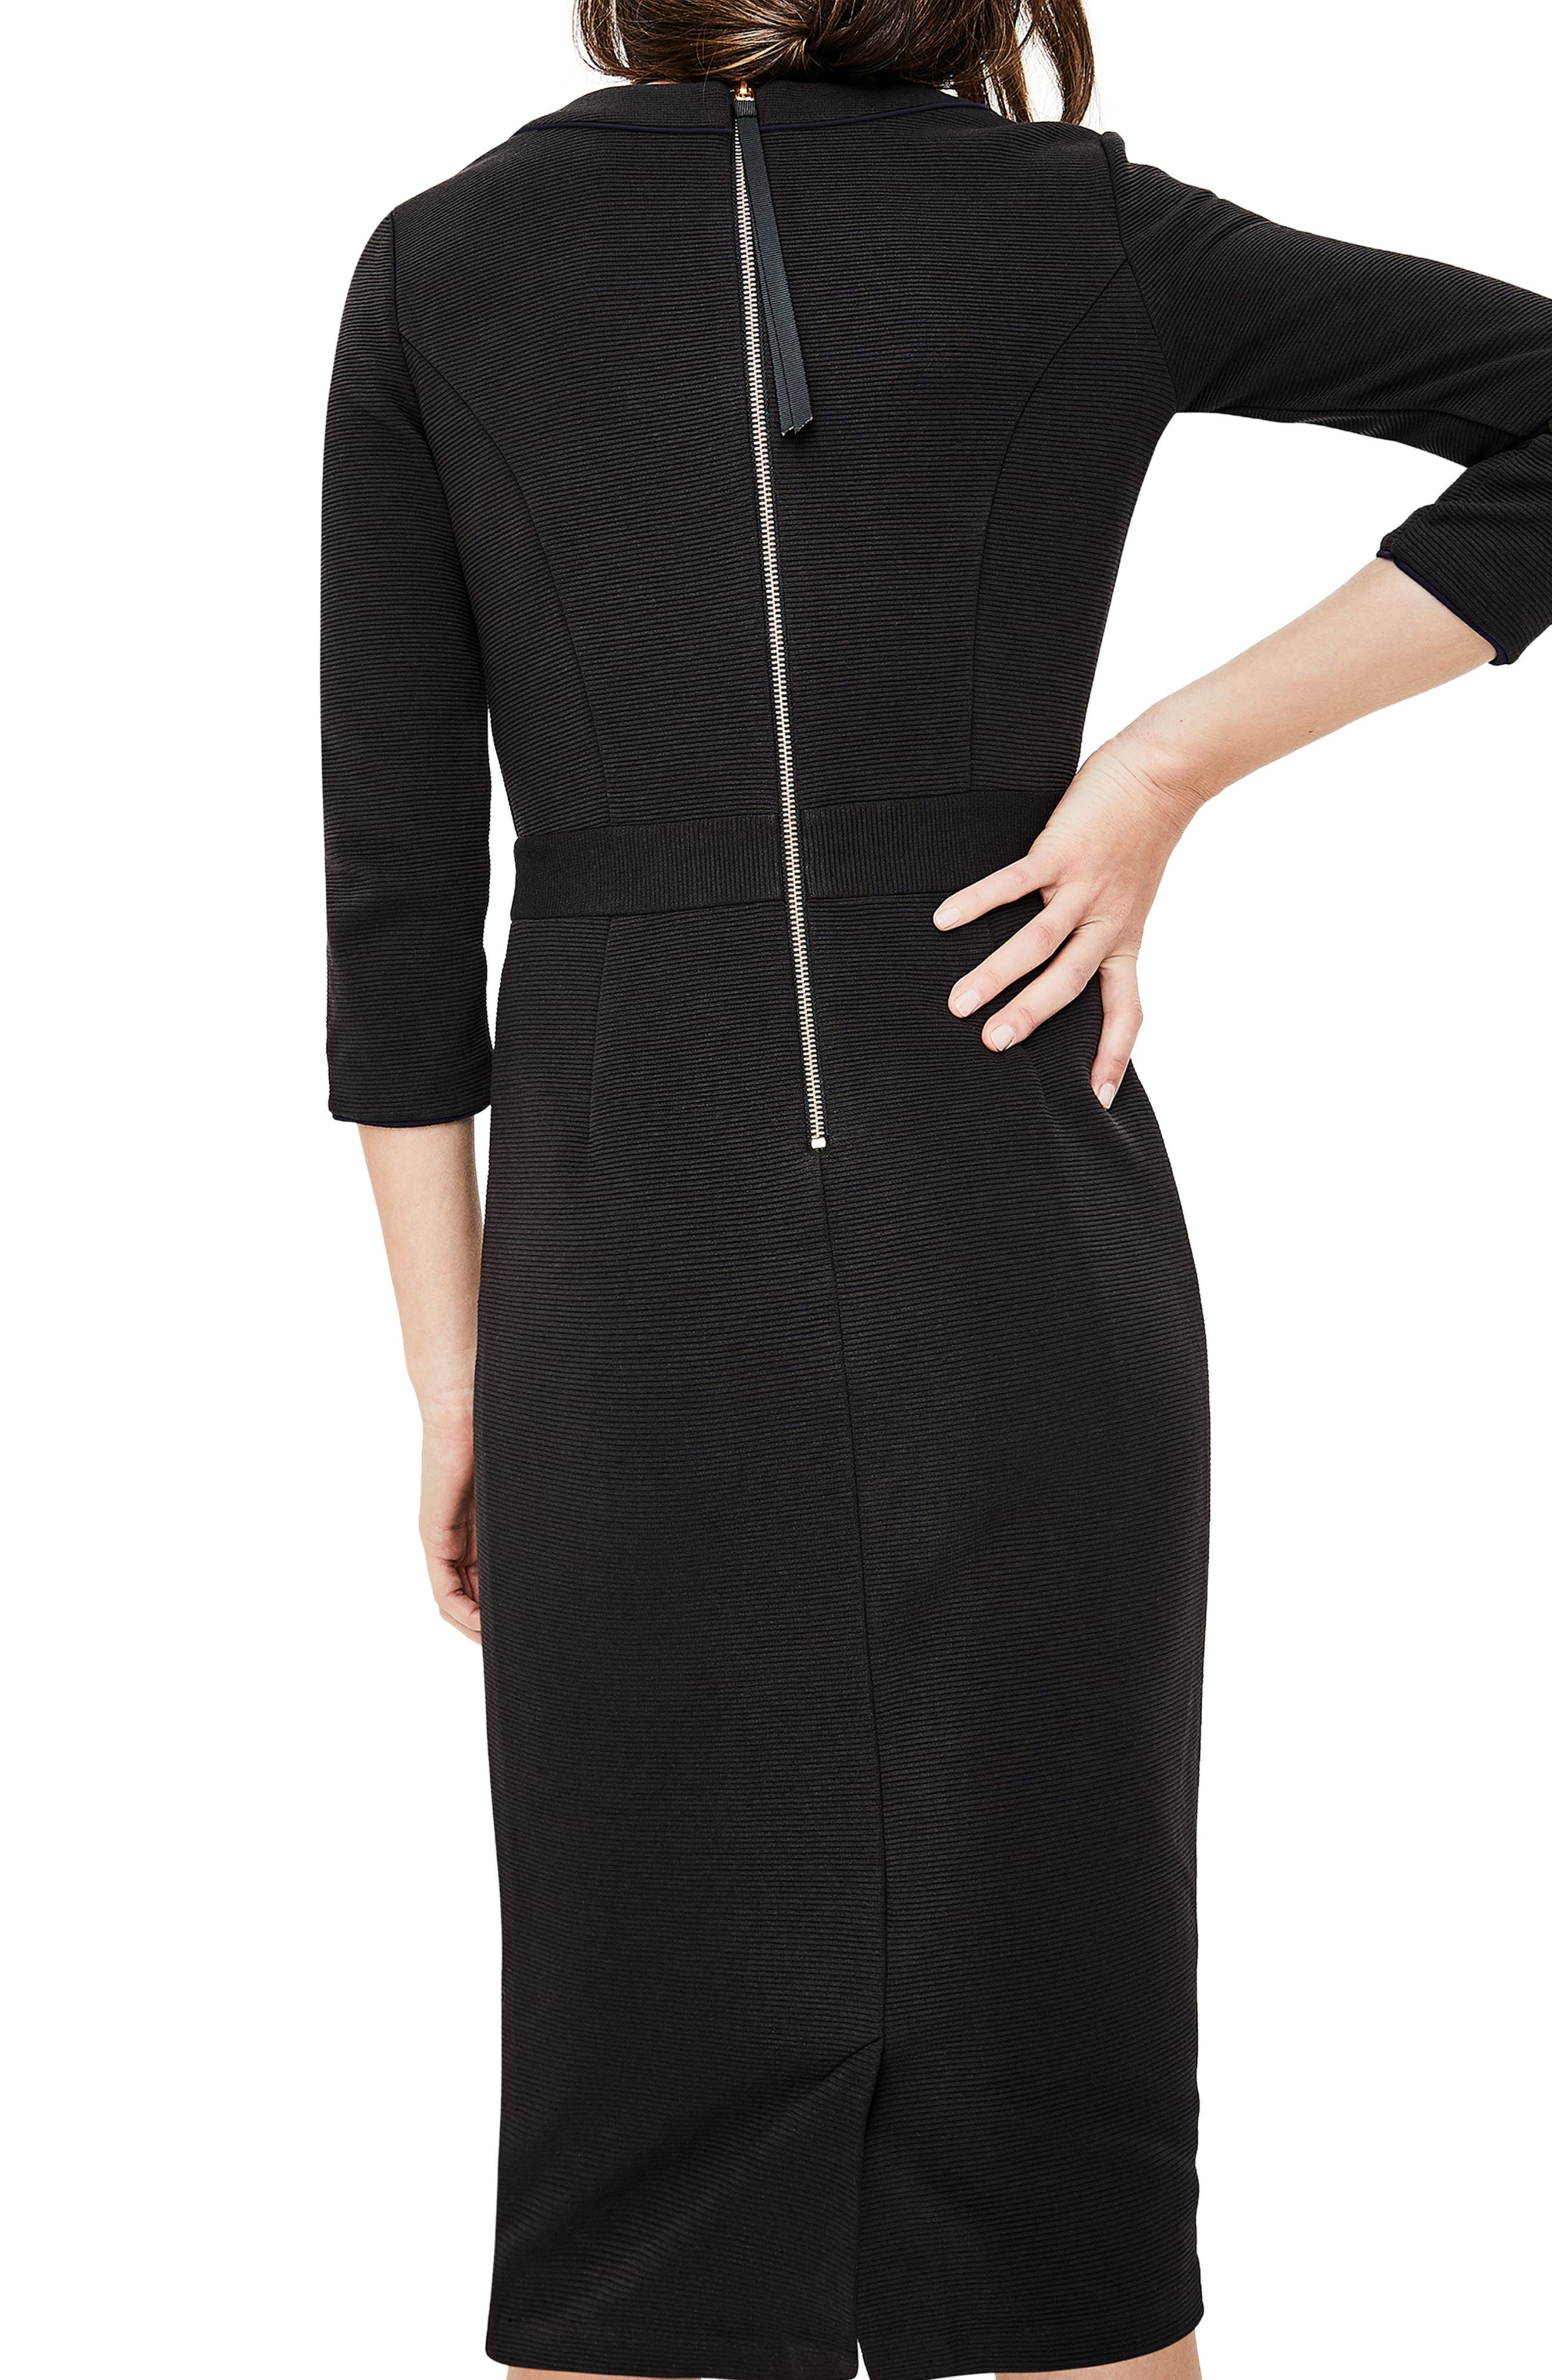 Mia Ottoman Dress,                             Alternate thumbnail 2, color,                             014